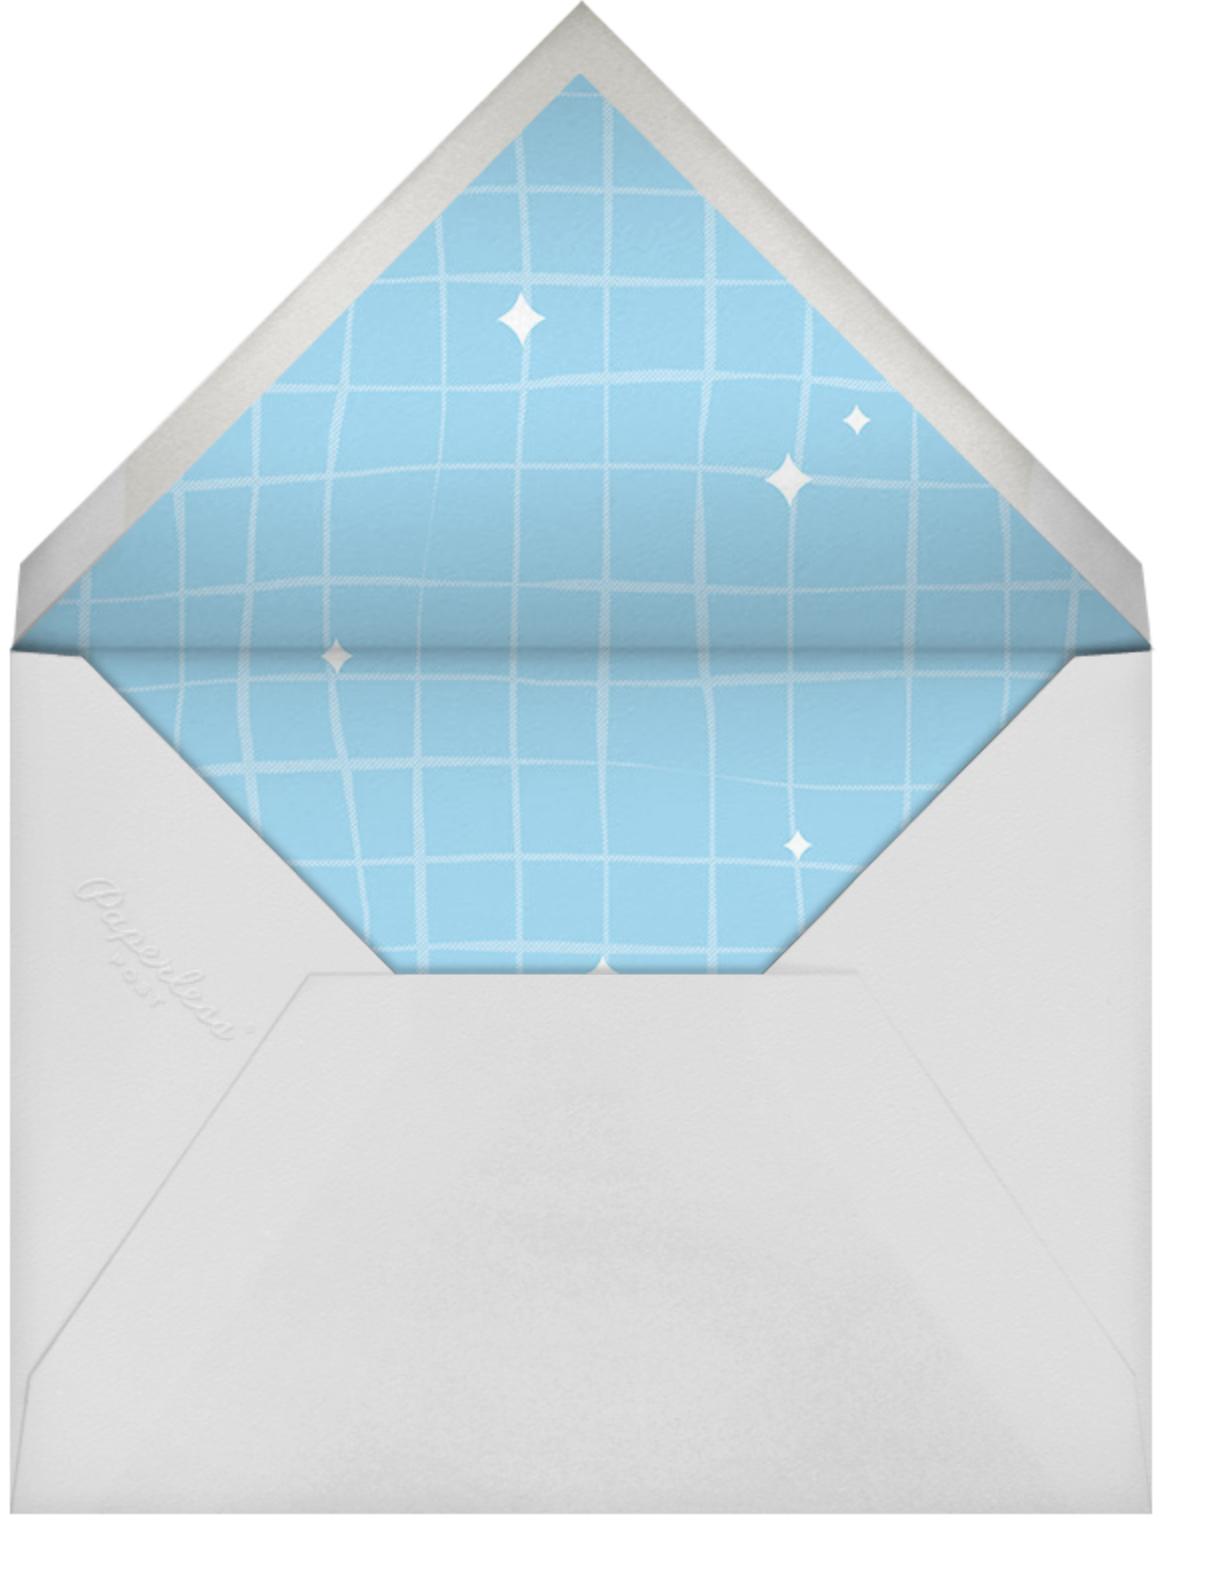 Mustard (Square) - Paperless Post - Envelope